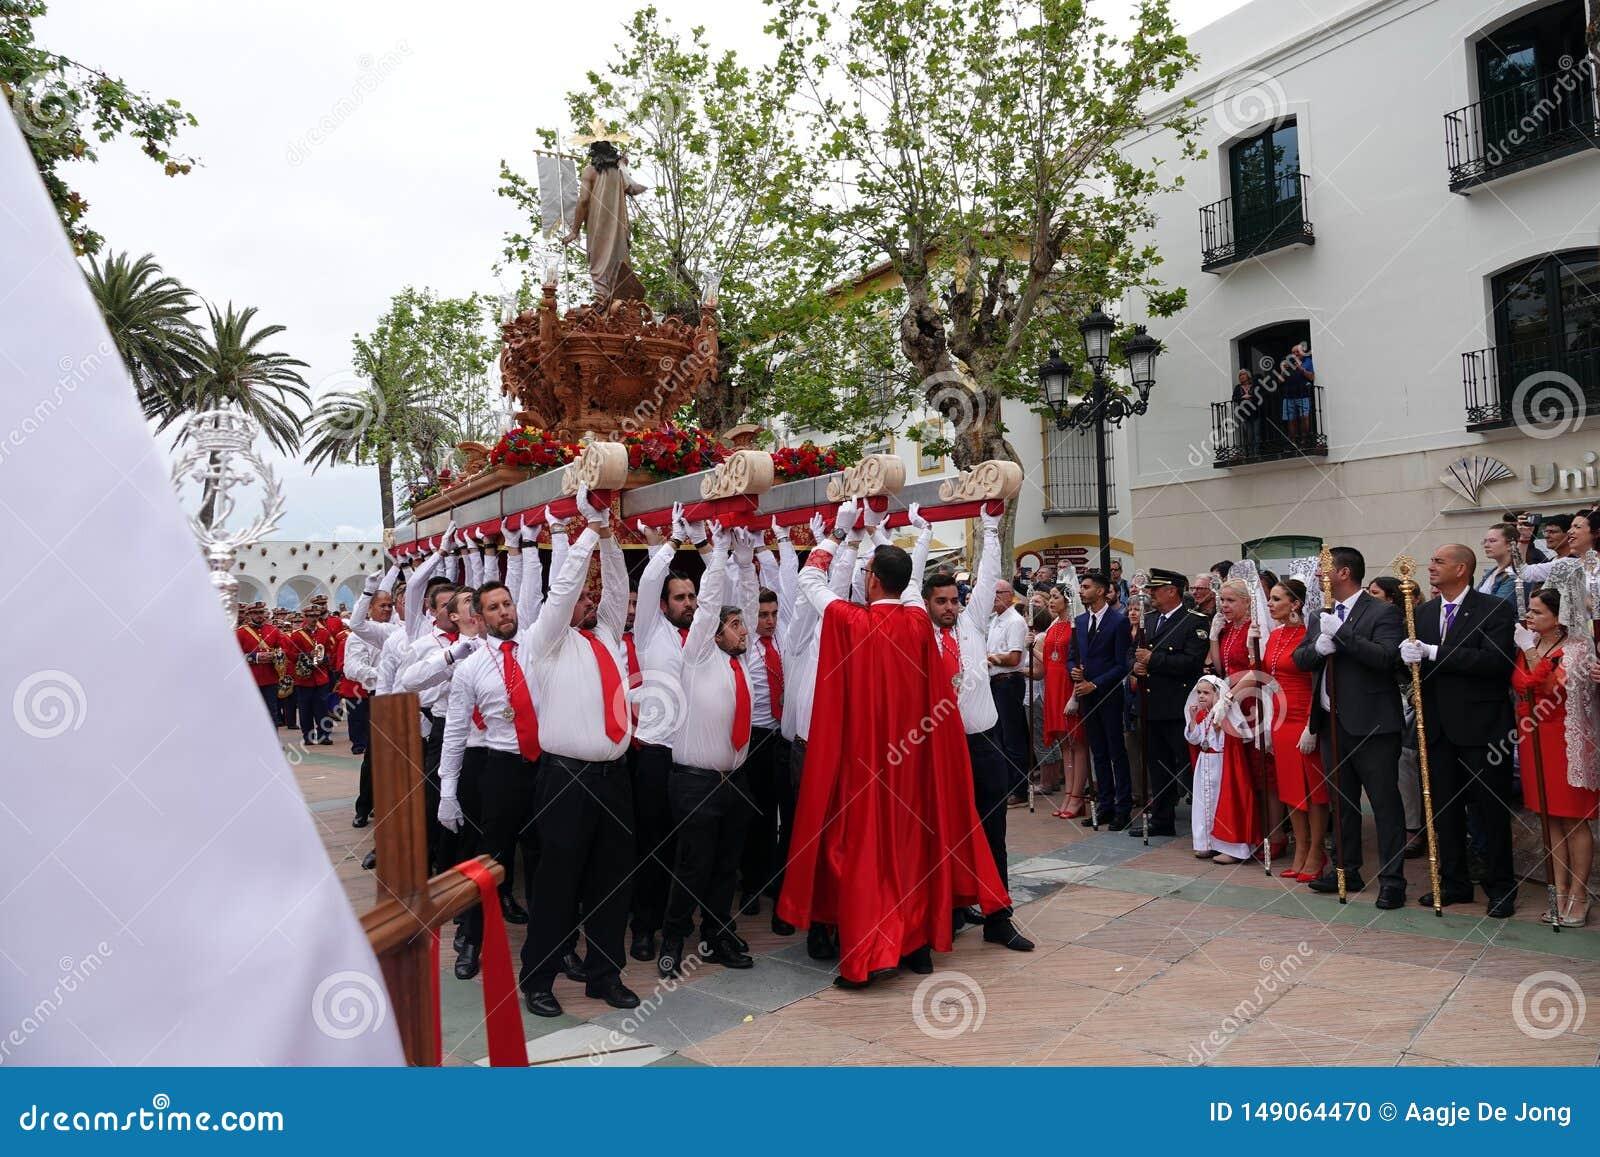 Semana Santa Easter Sunday à Nerja, Andalousie, Espagne